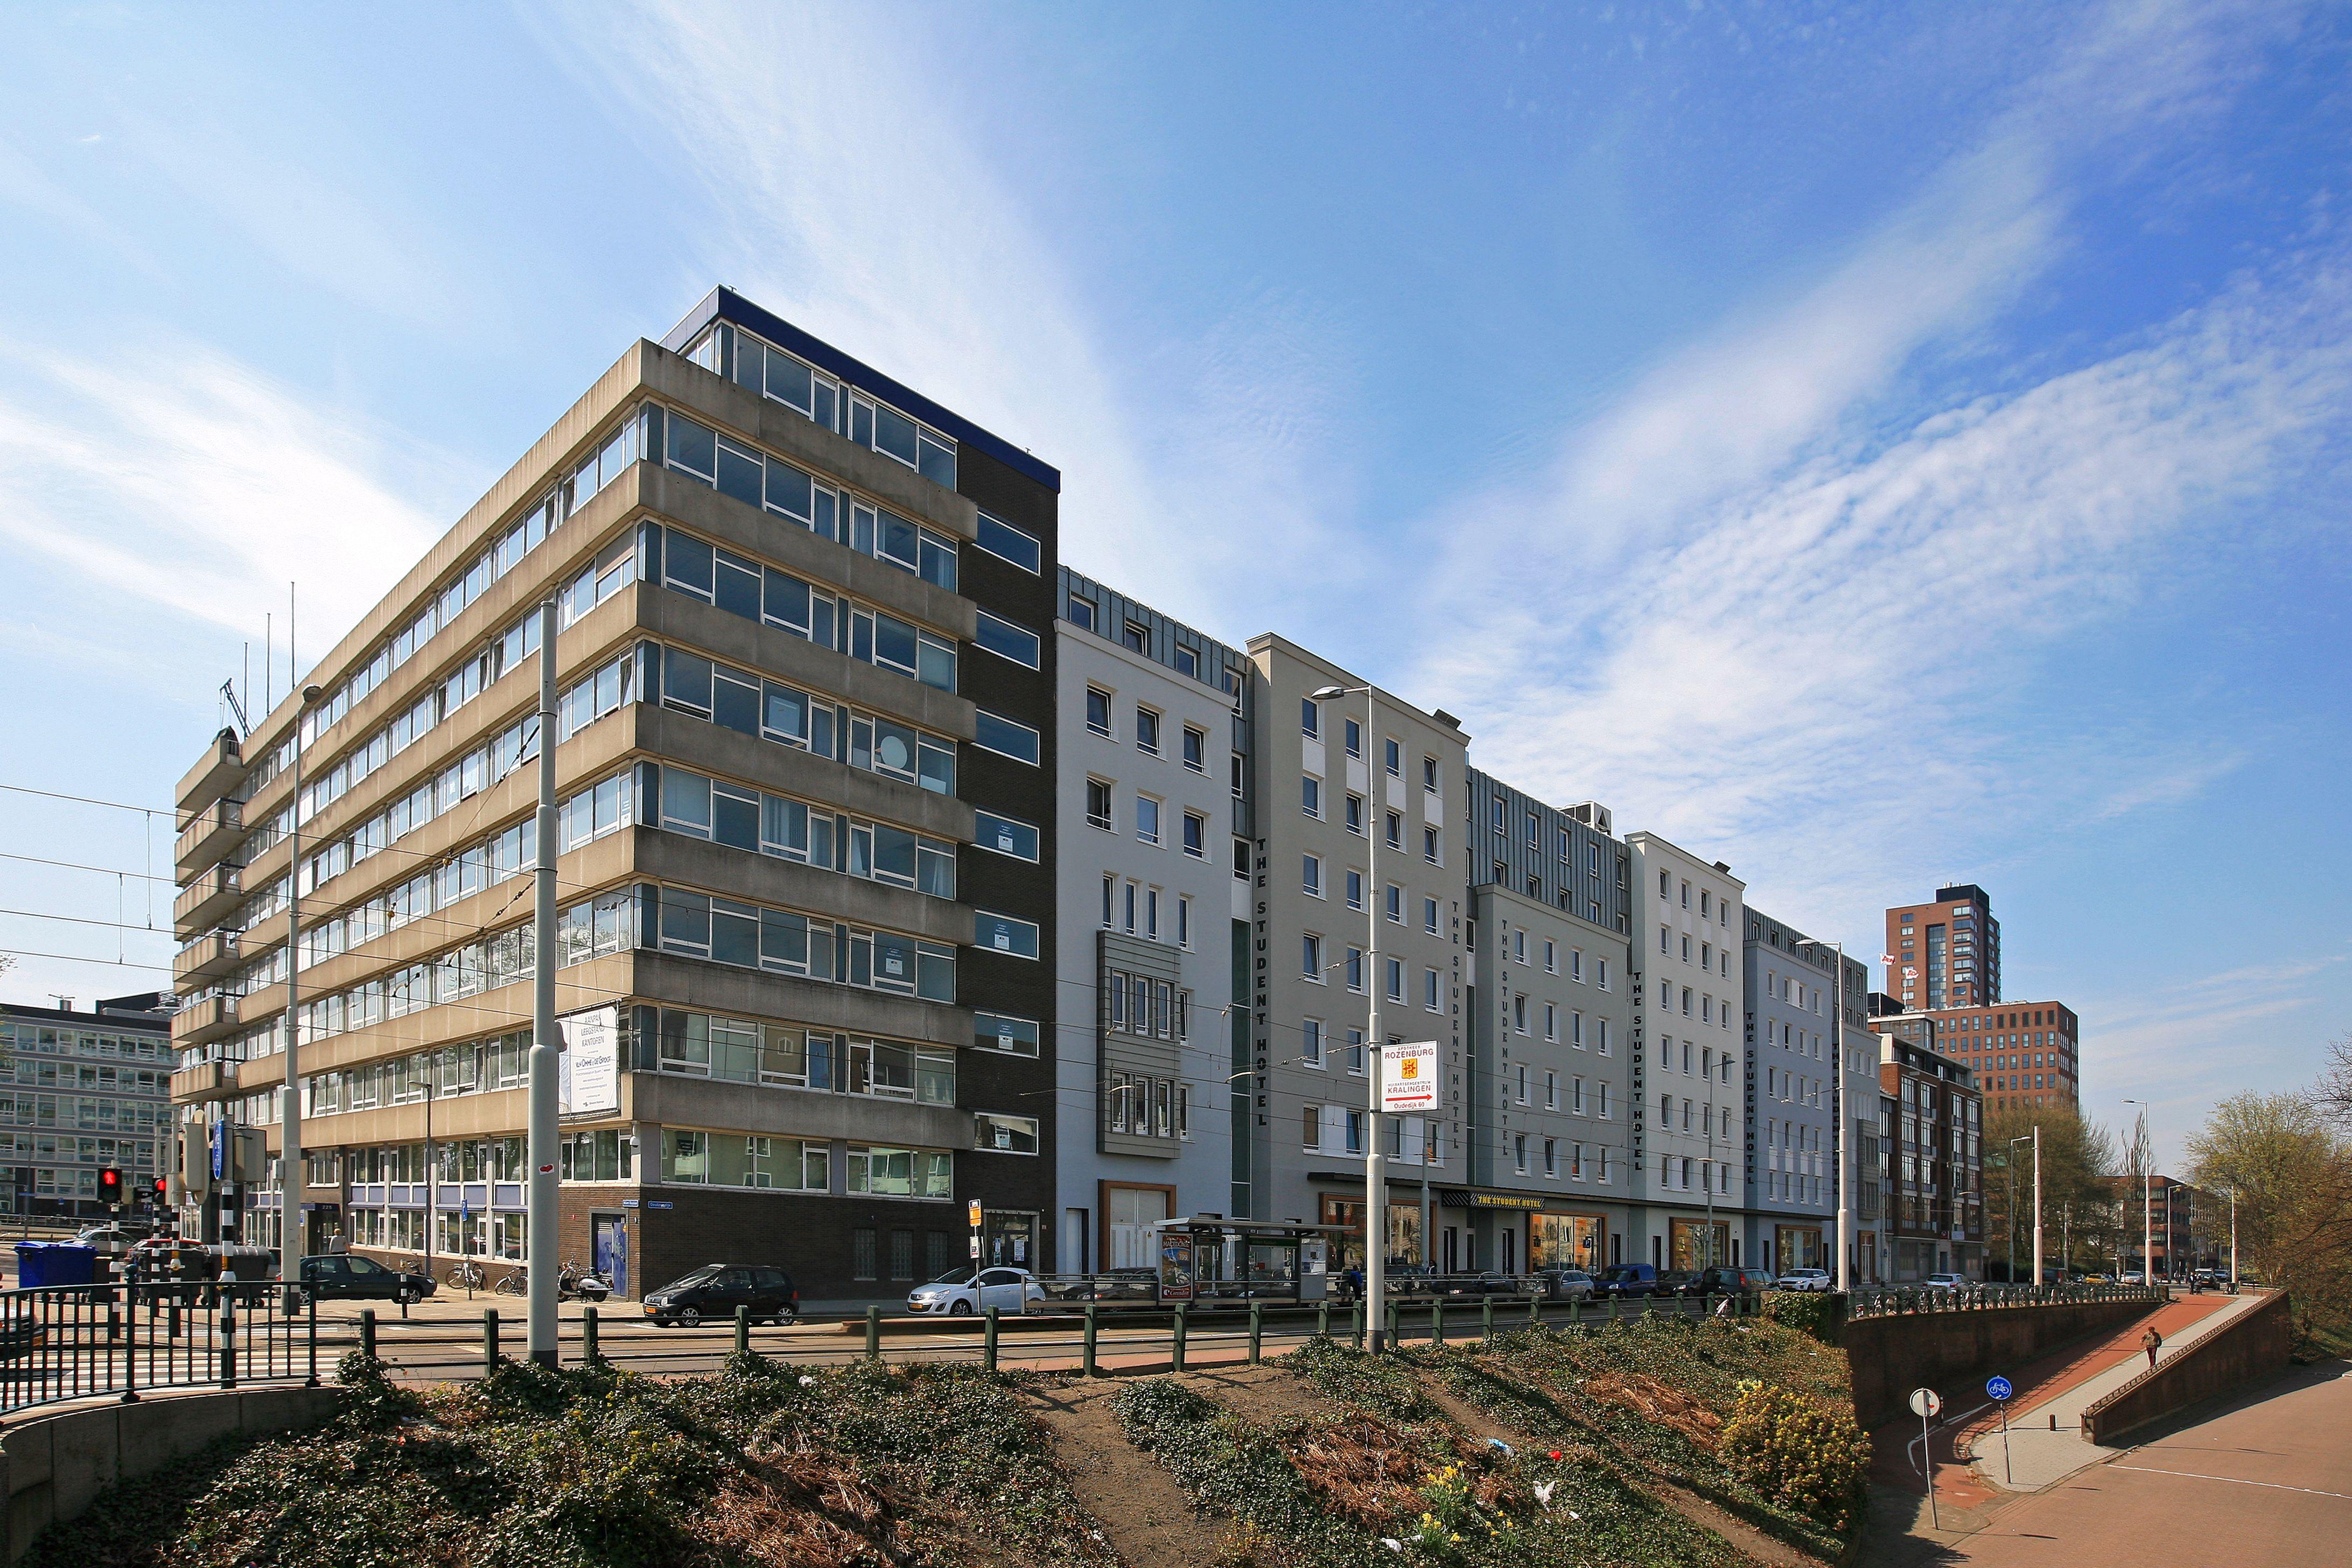 Trendy Studentenhotel in industriepand